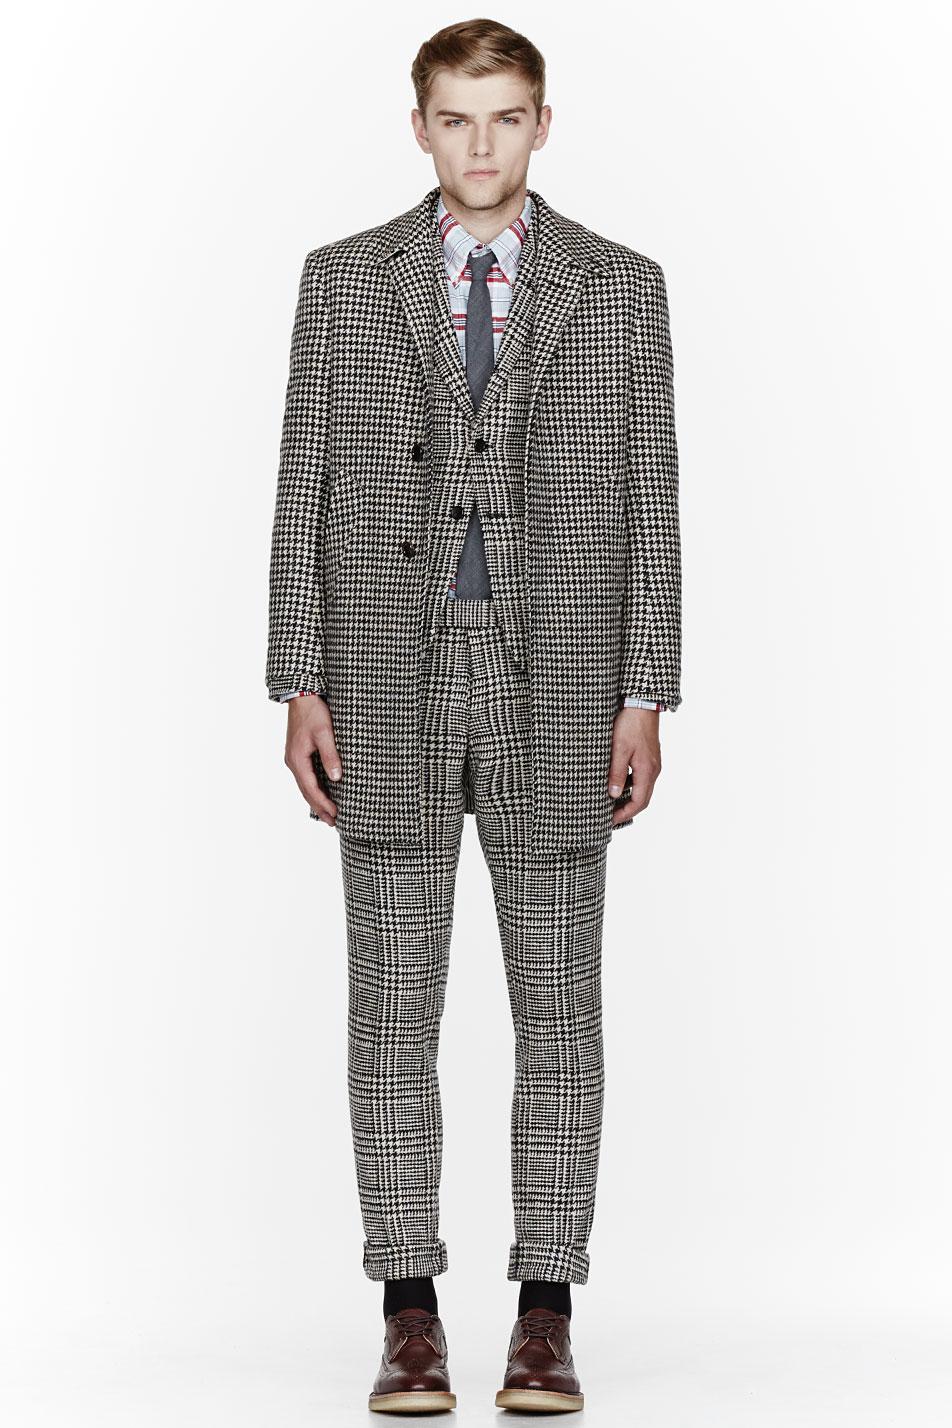 Glen Plaid Suit x Herringbone Coat Thom Browne 2